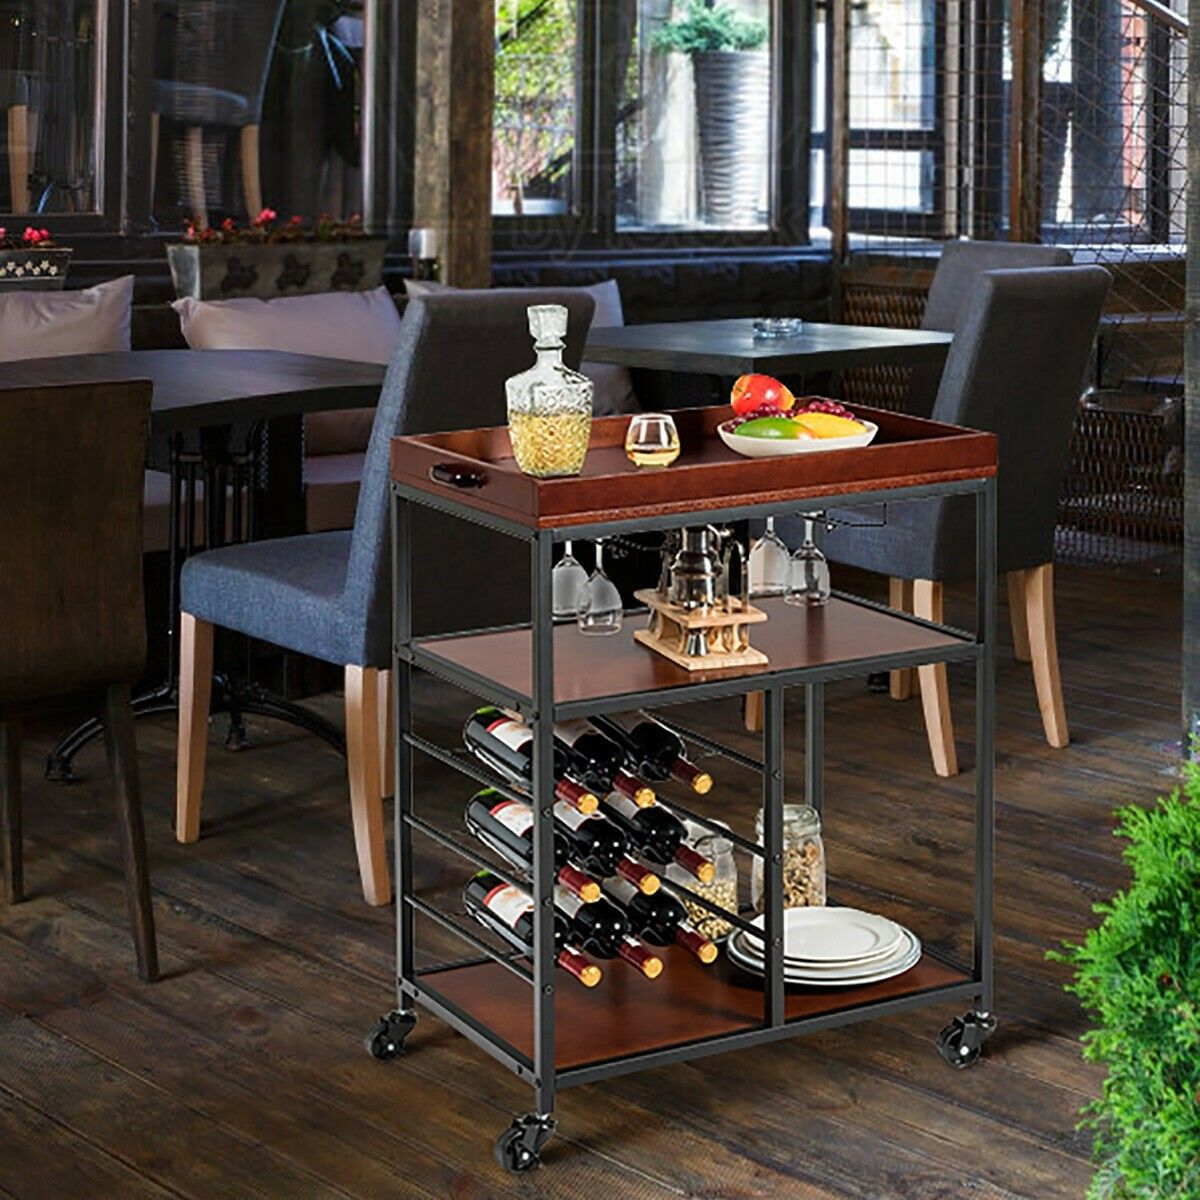 3 Tier Storage Bar Serving Cart With Wine Rack And Glass Holder Kitchen Island Furniture Kitchen Island Cart Kitchen Cart